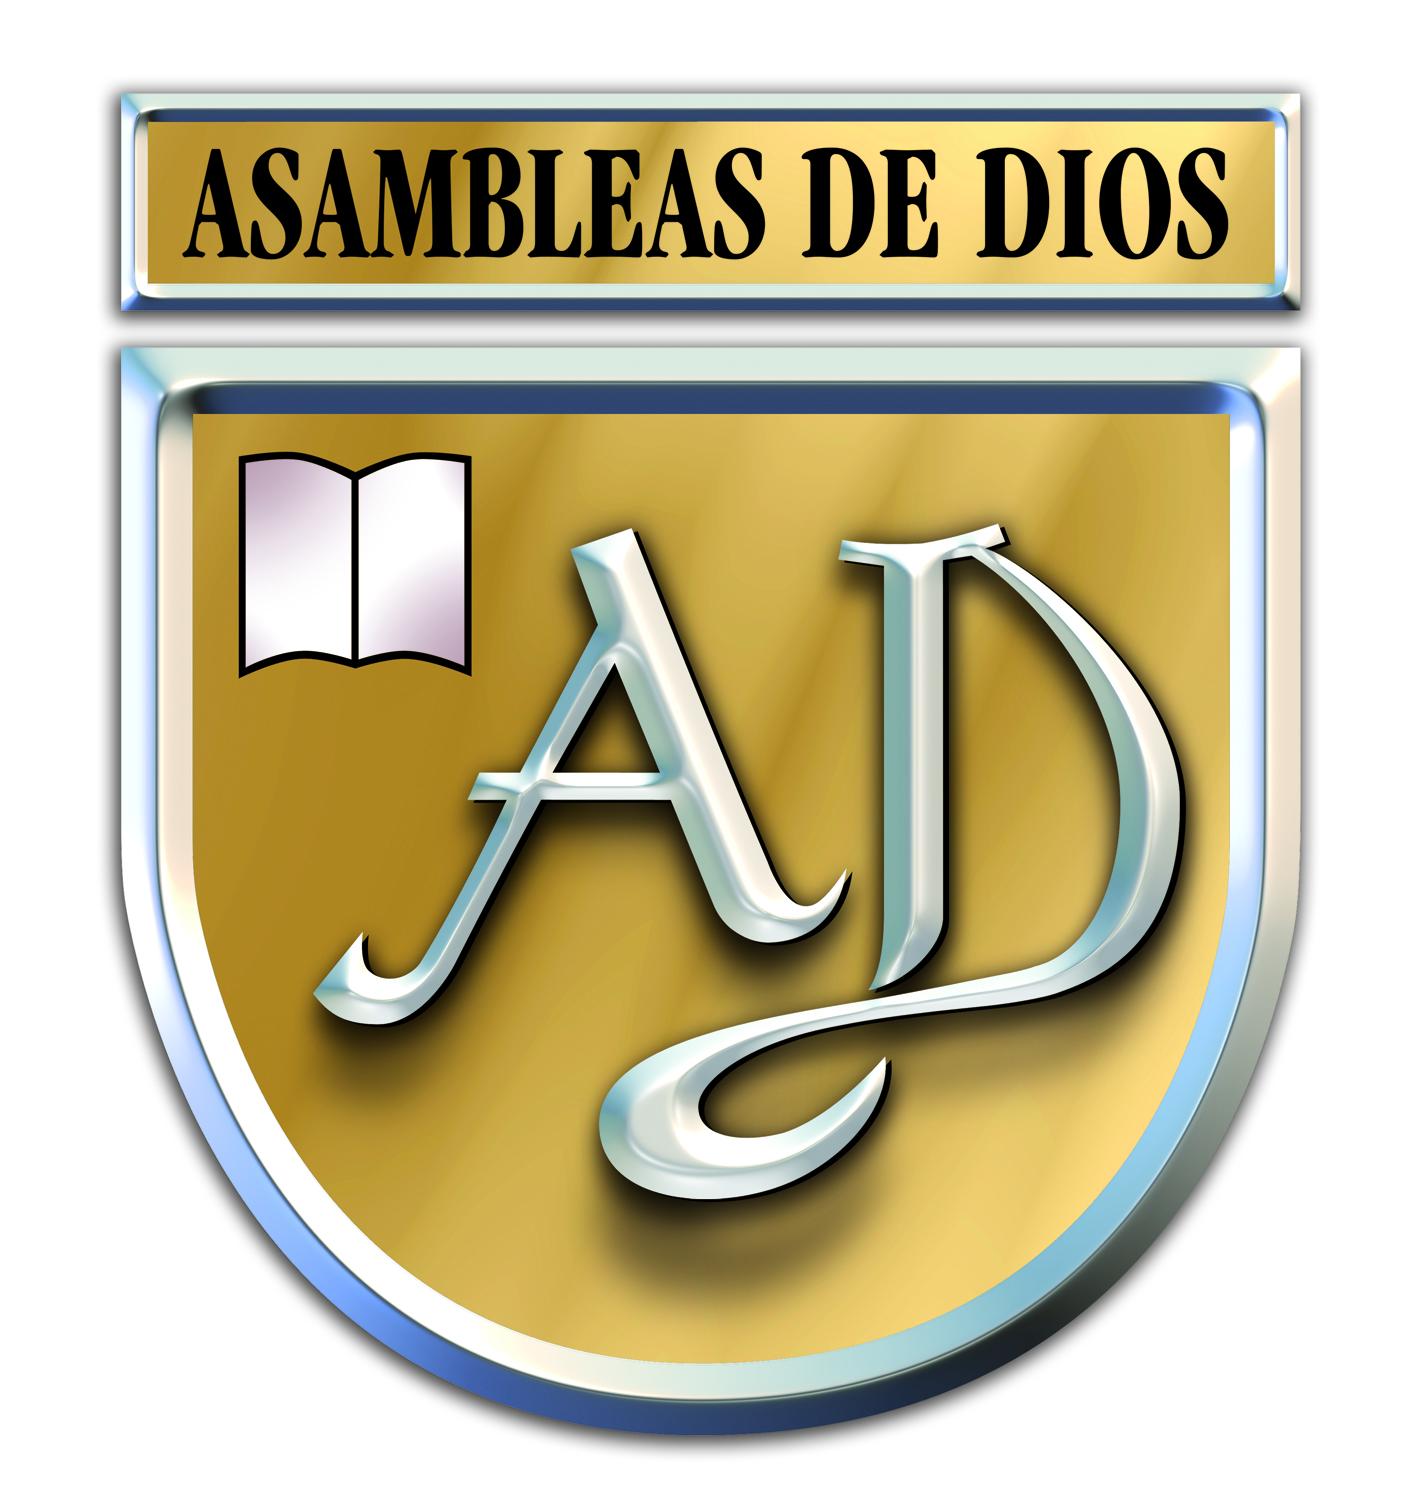 Logo Asambleas De Dios PNG-PlusPNG.com-1417 - Logo Asambleas De Dios PNG